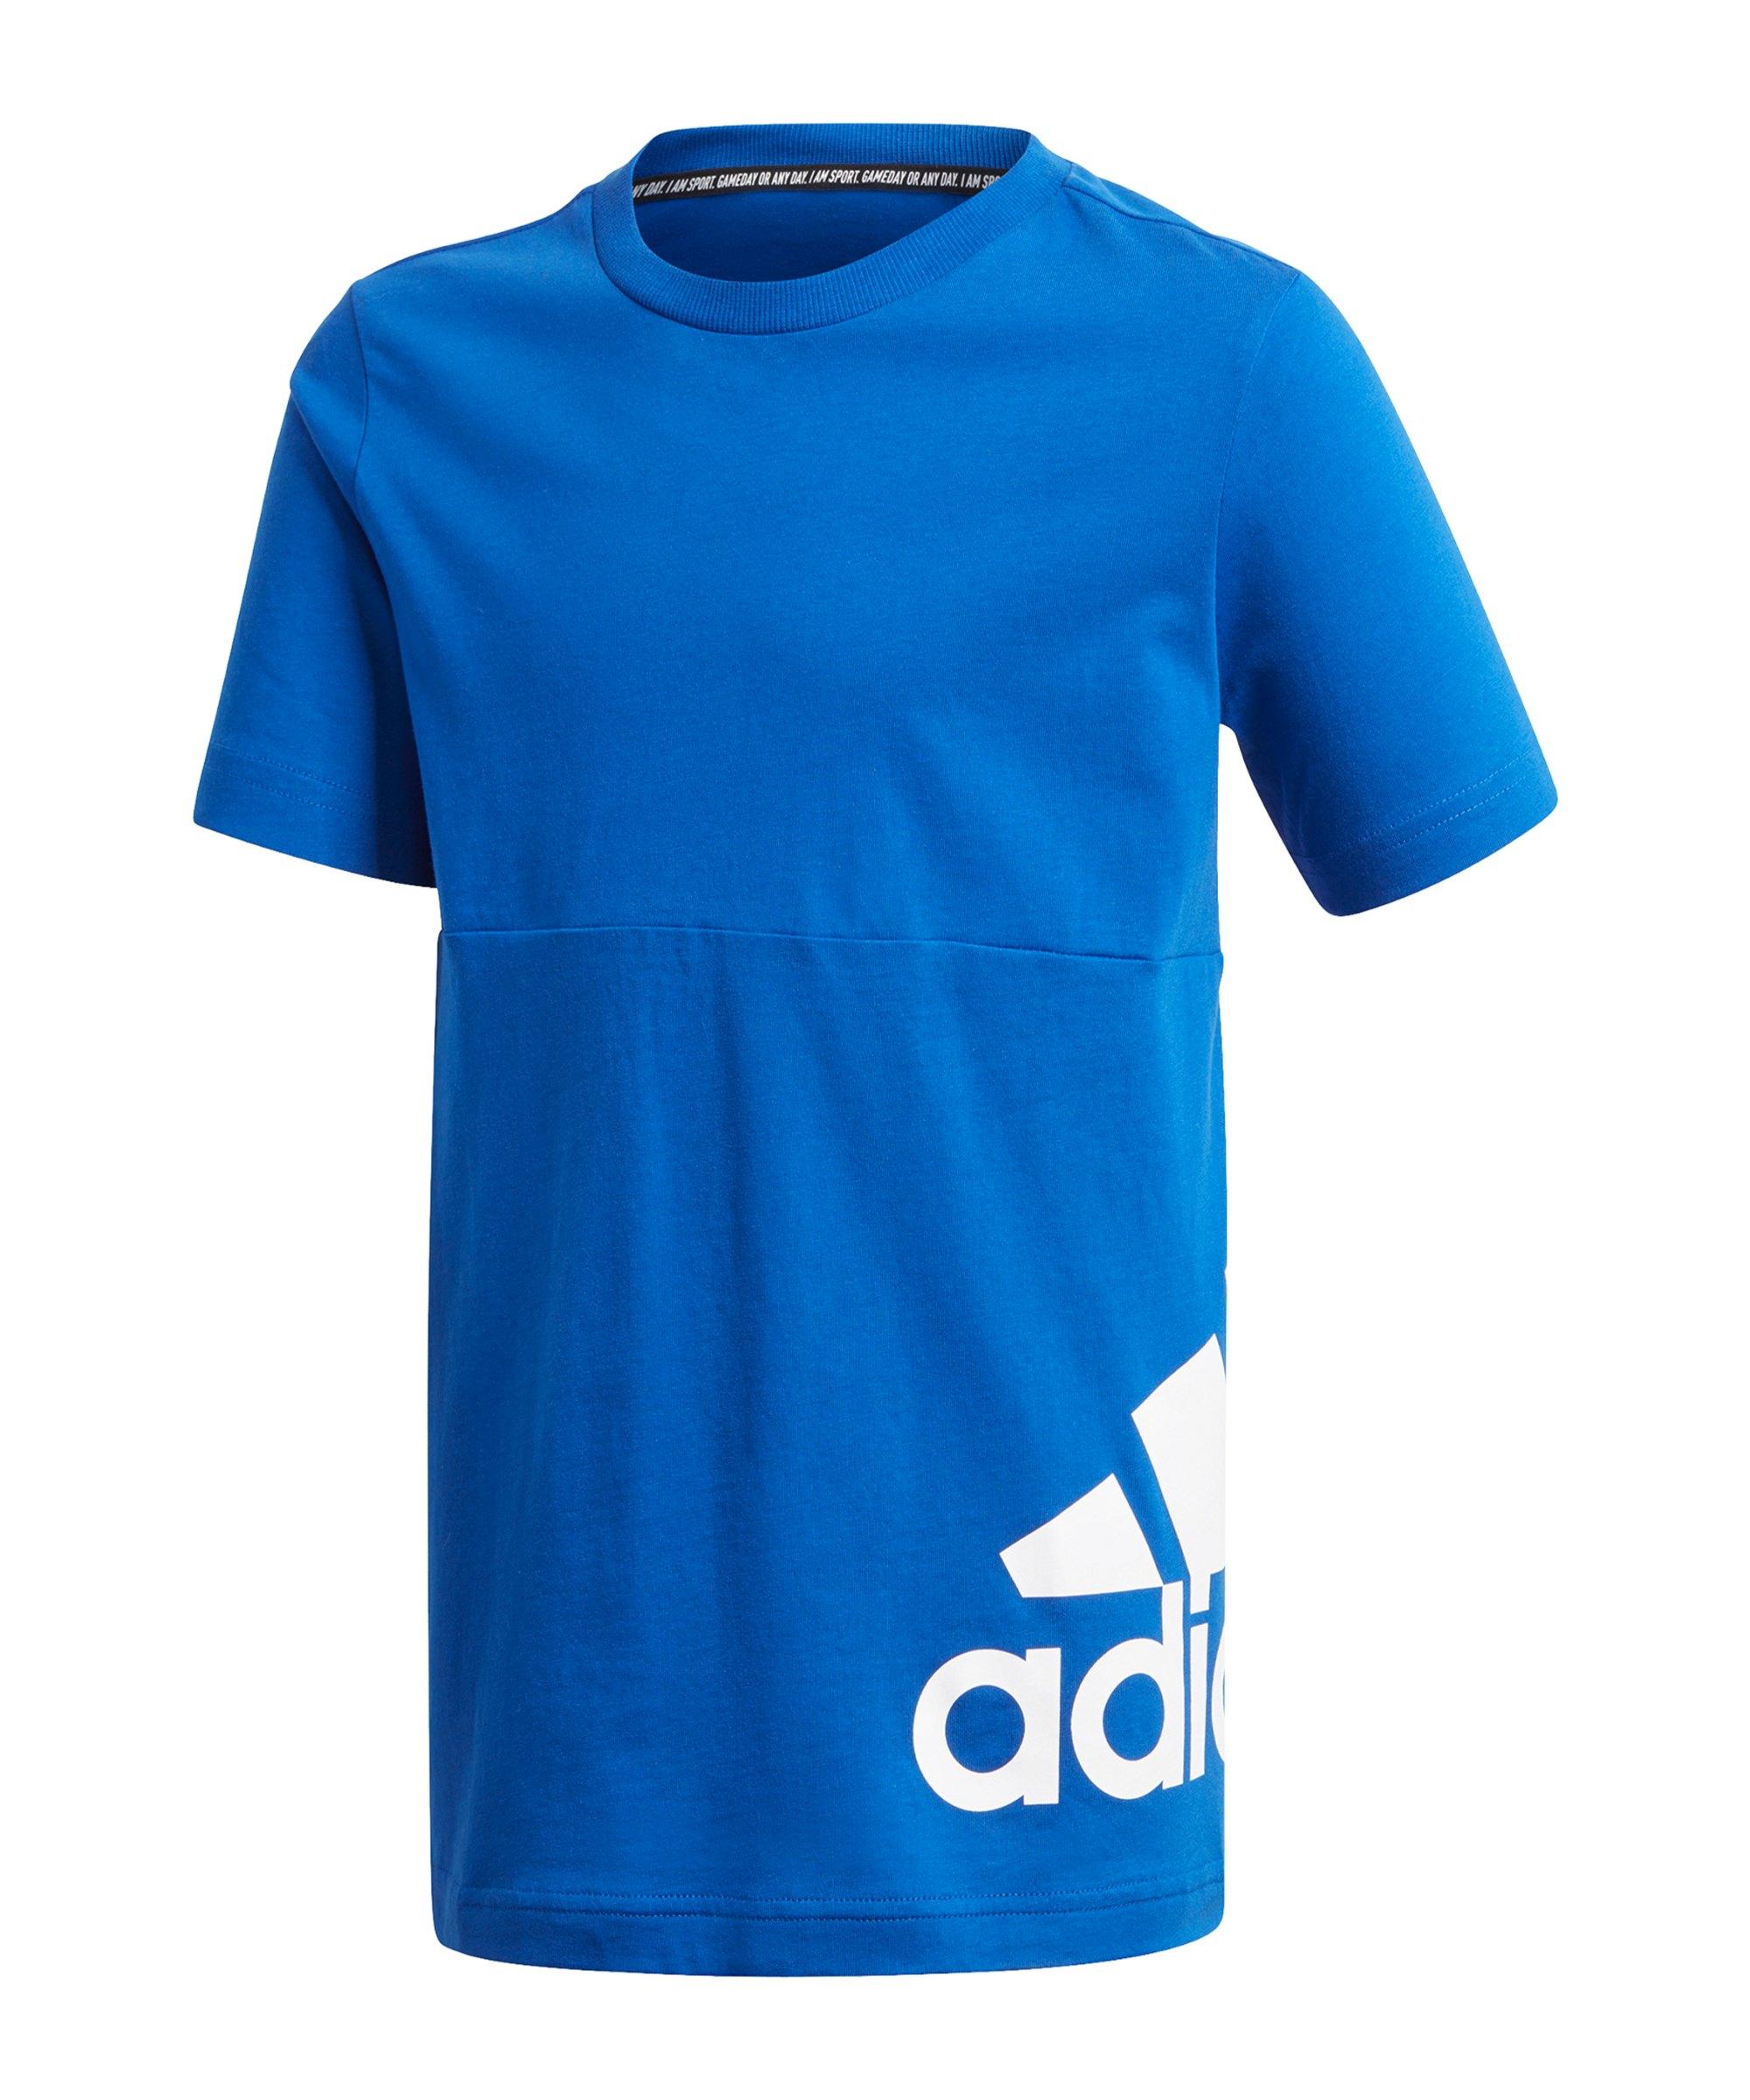 adidas Must Haves Big Logo T-Shirt Kids Blau Weiss - blau